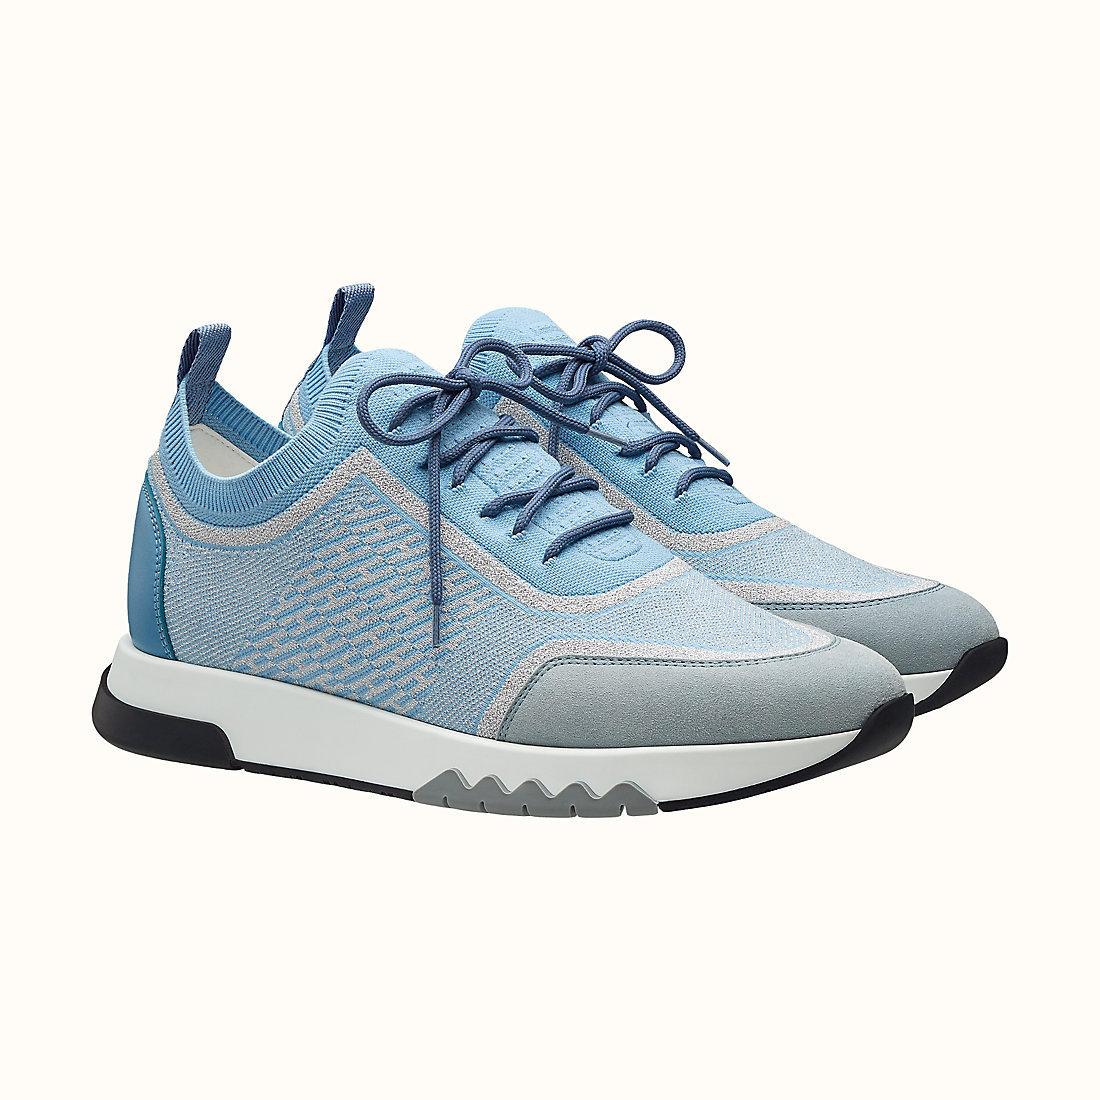 HERMES Addict sneaker Argent/Bleu Faïence